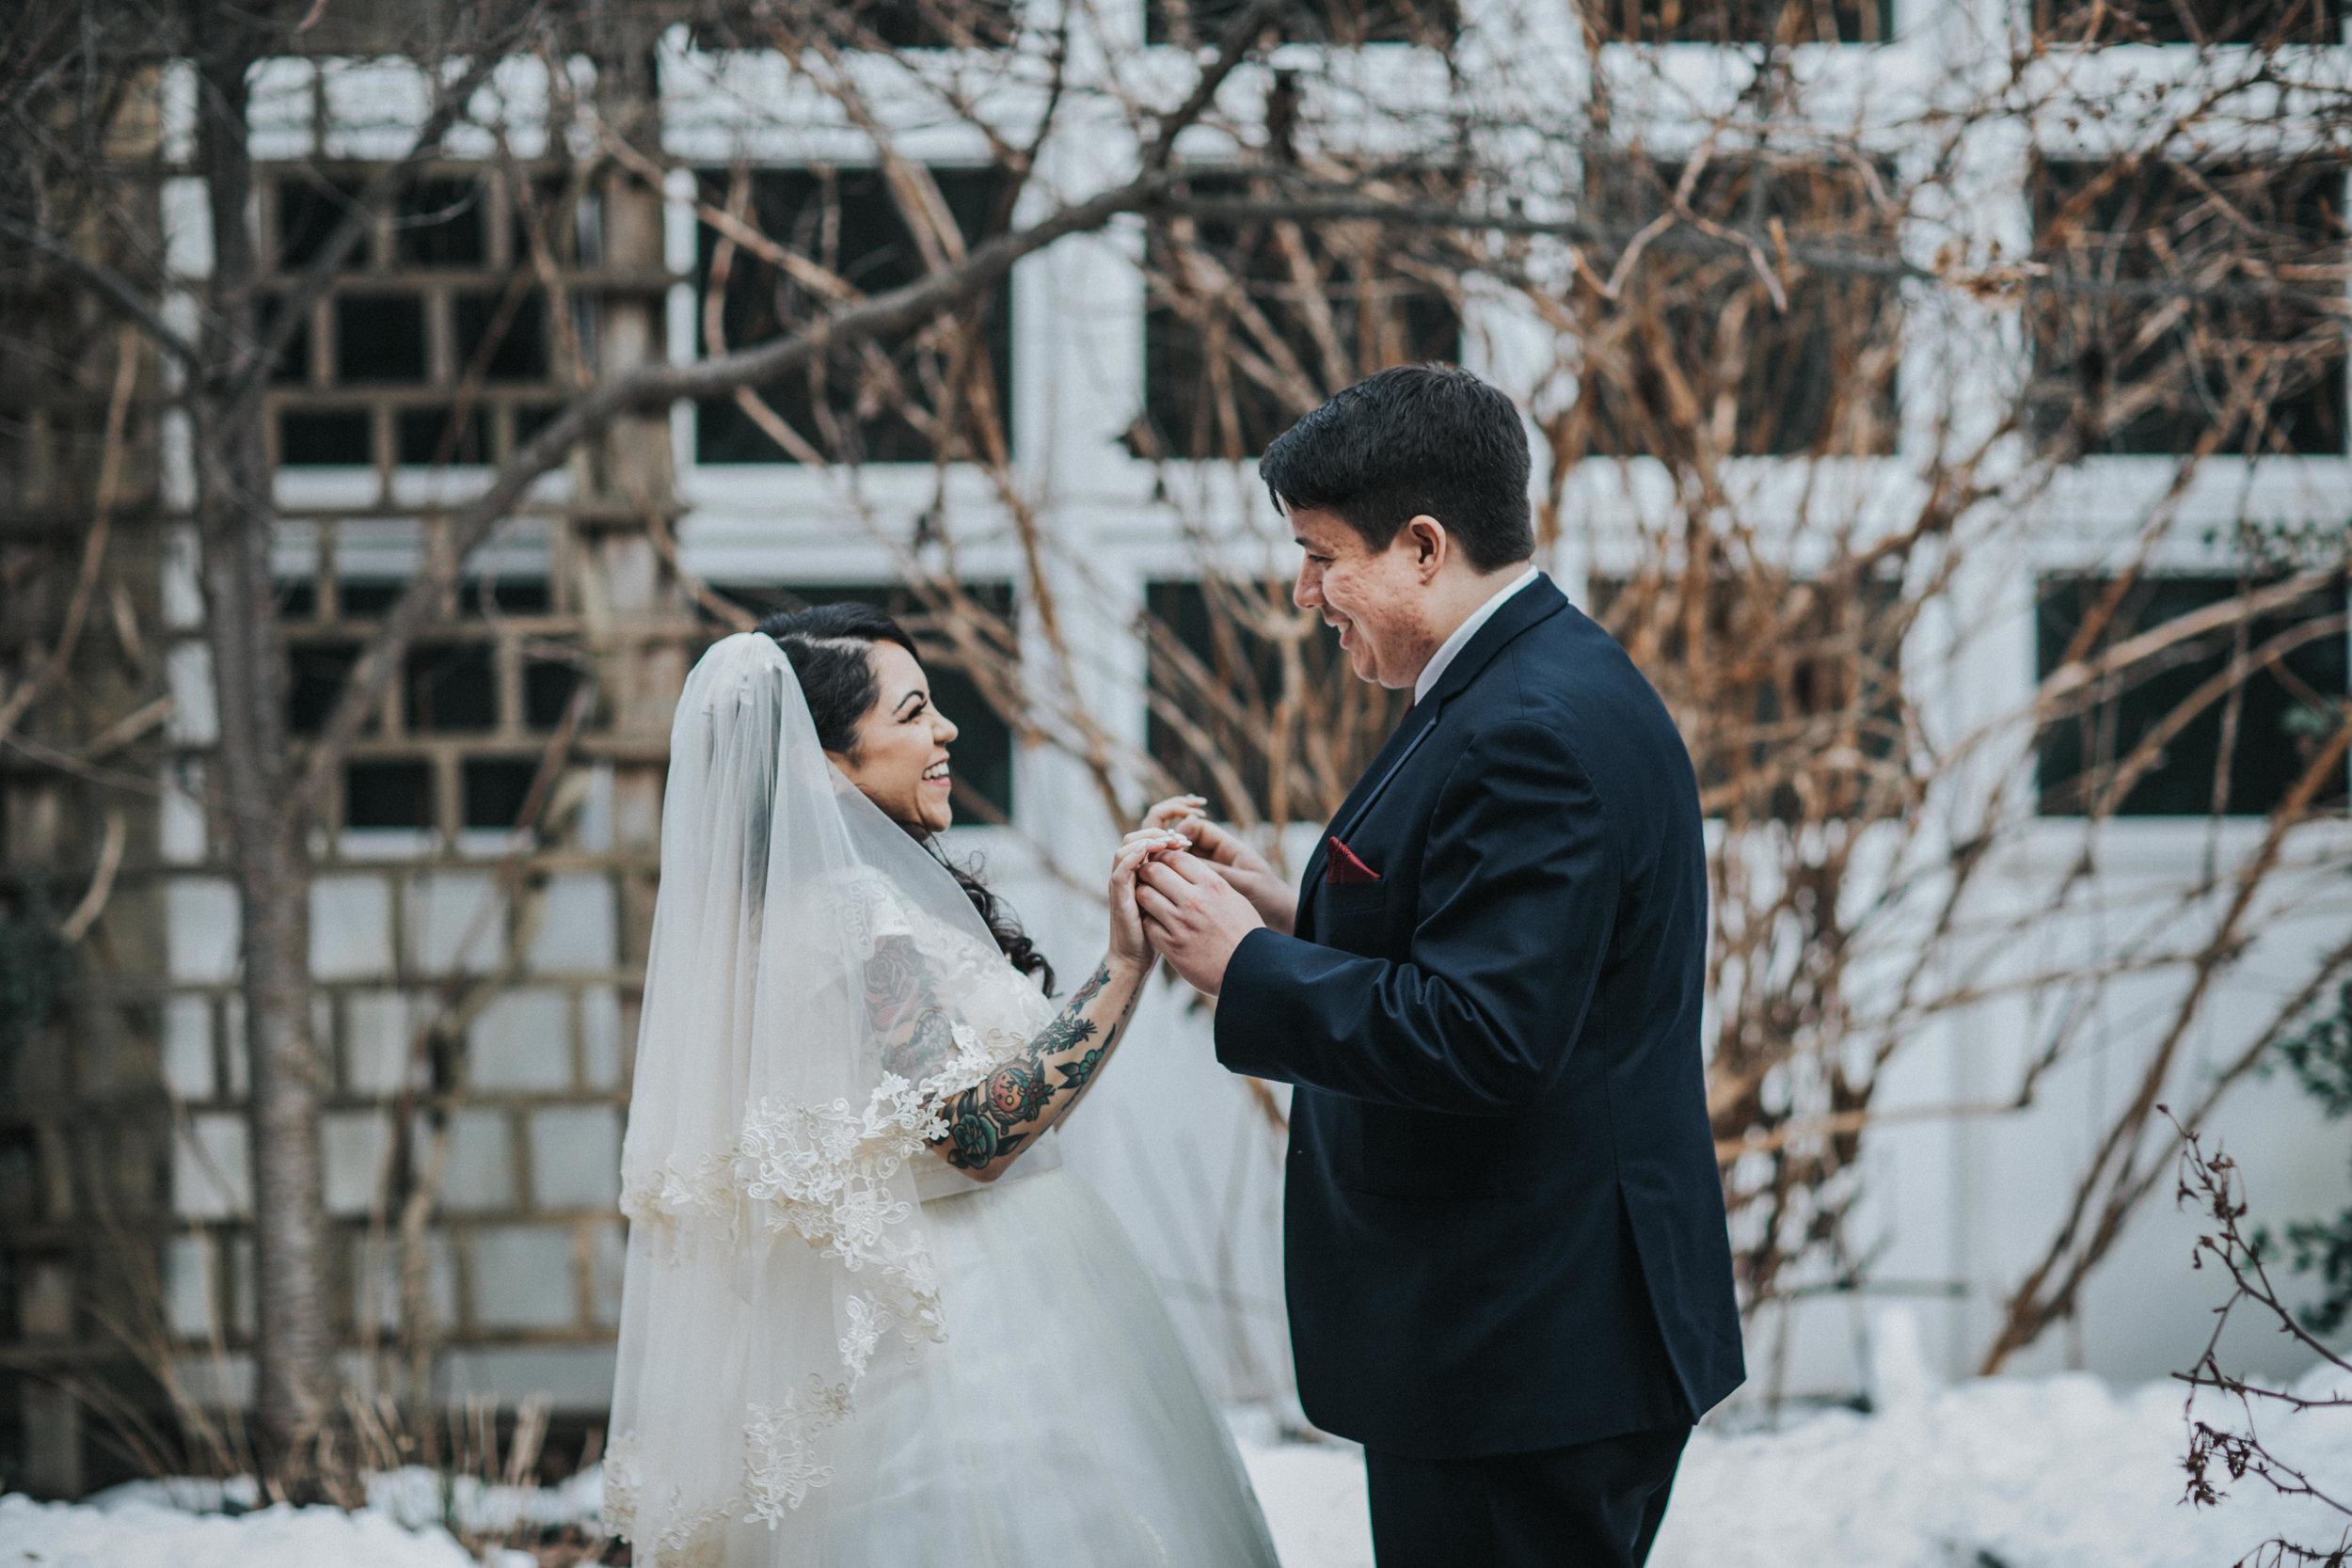 New-Jersey-Wedding-Photographer-ReceptionCenter-Valeria&Mike-First-Look-Bride&Groom (58 of 69).jpg